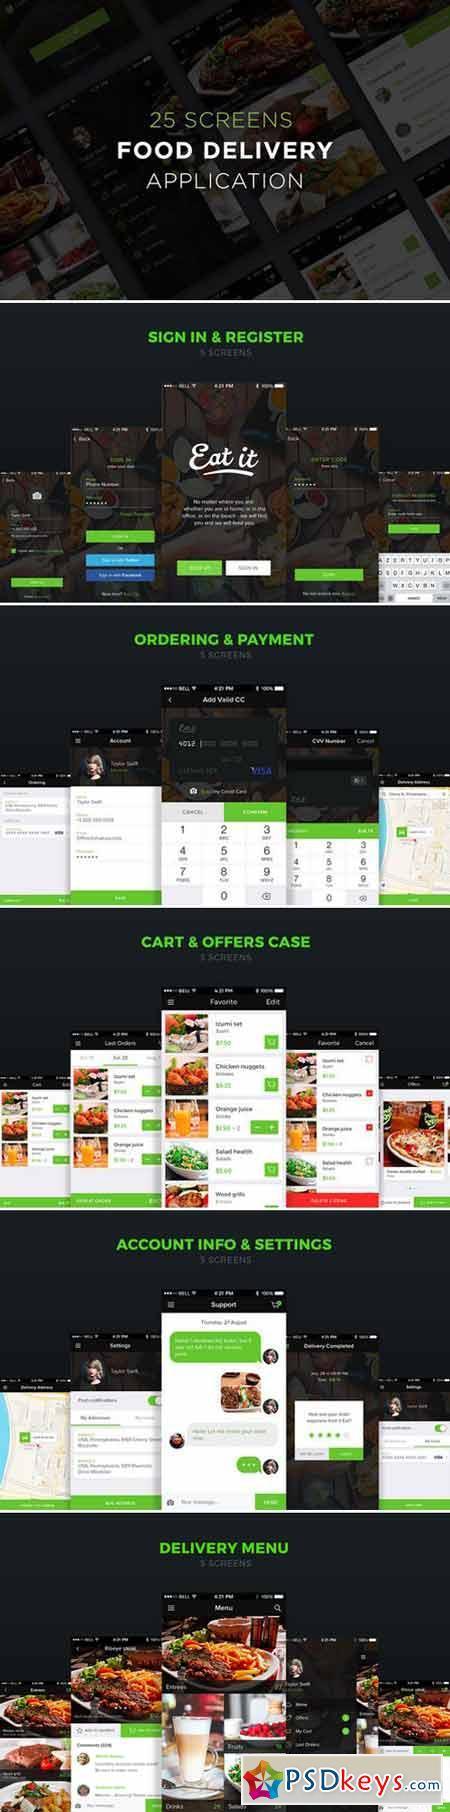 Food delivery app UI 414158